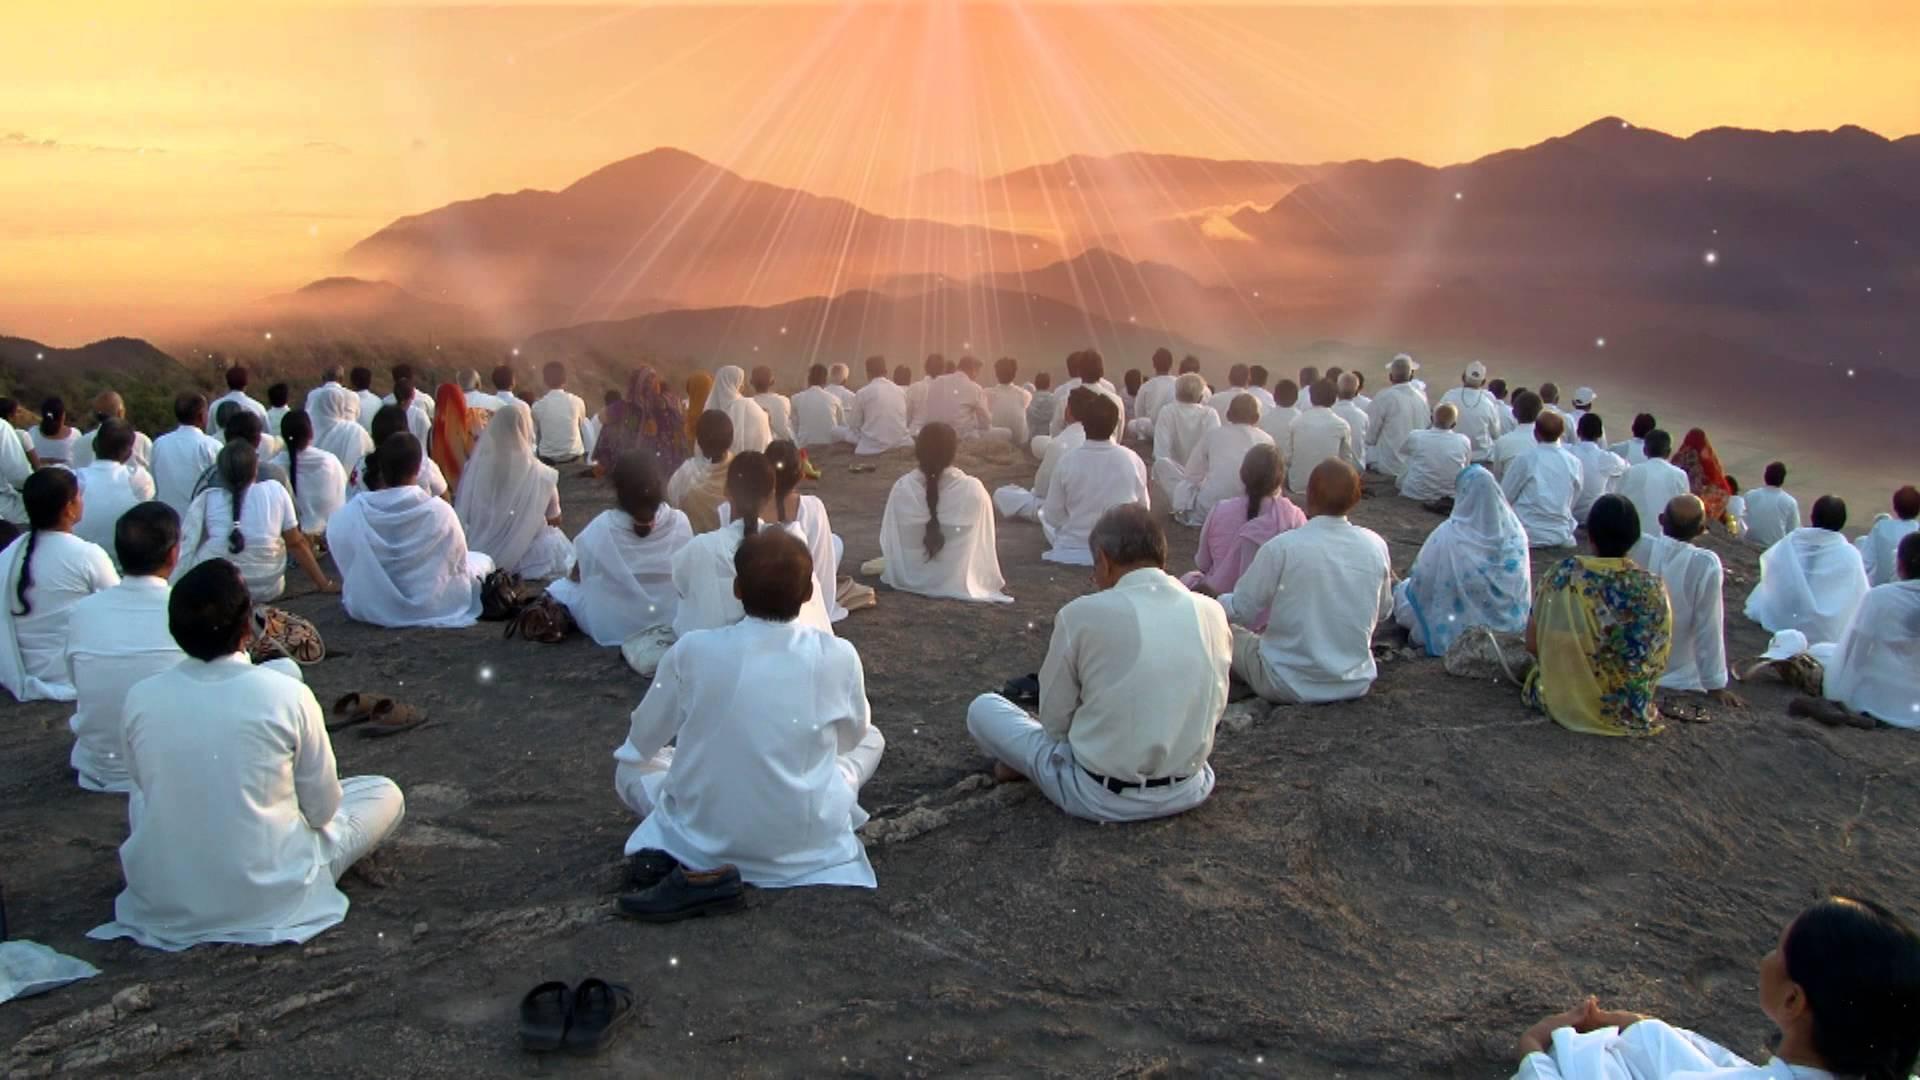 Samen mediteren, ja gezellig…